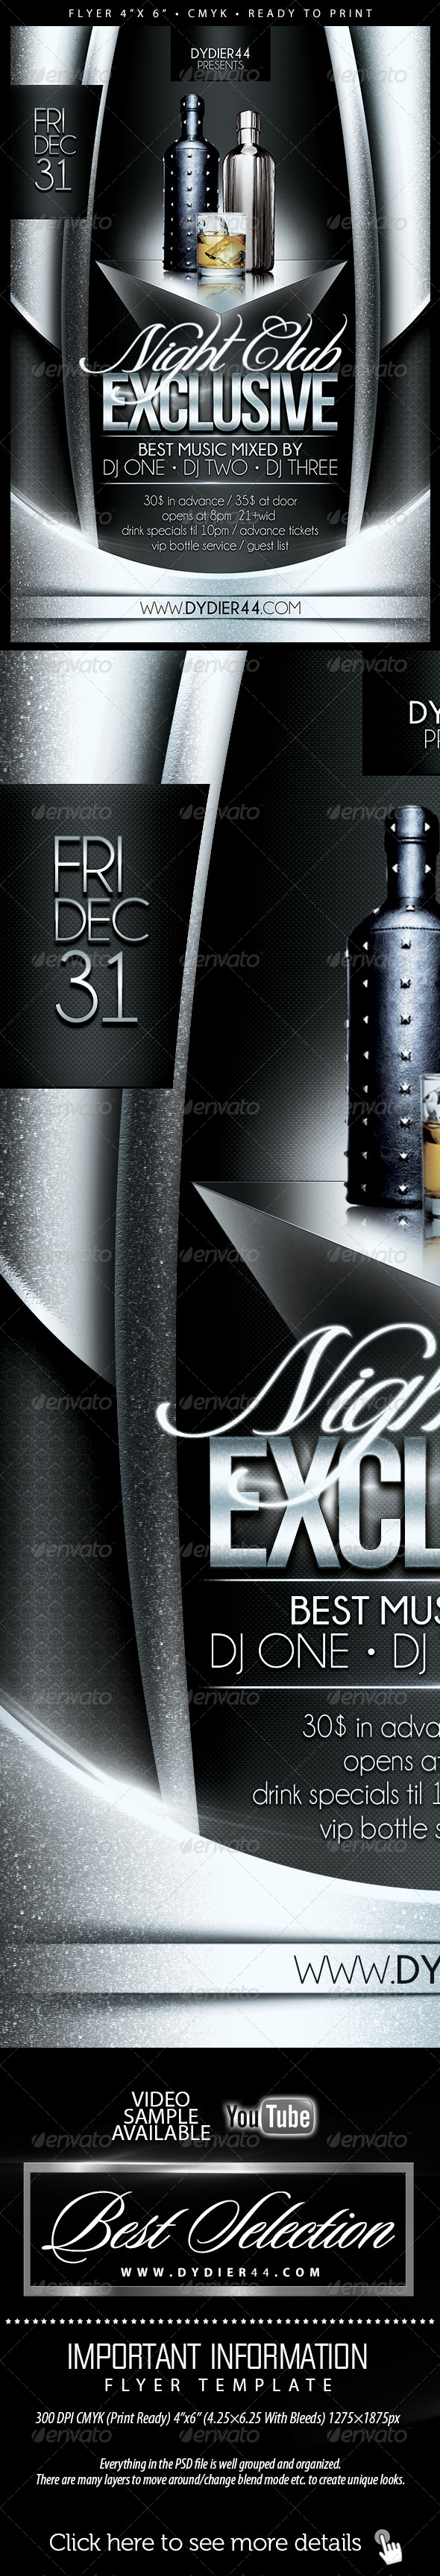 Nightclub Exclusive Flyer Template 4x6